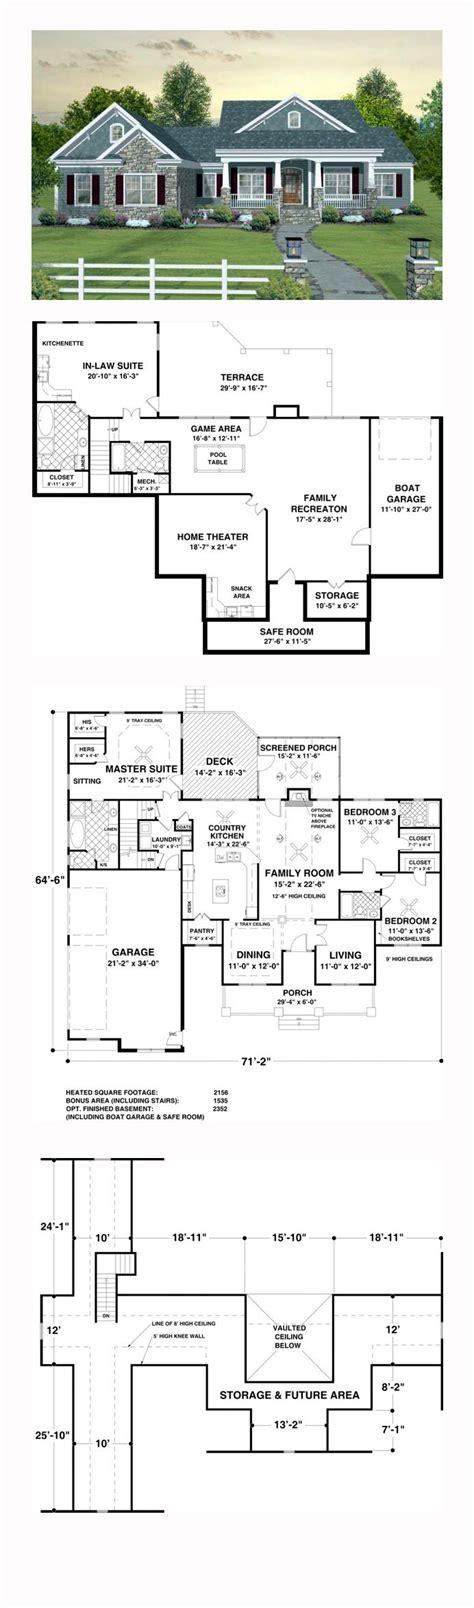 basement apartment floor plans 17 amazing basement apartment floor plans home design ideas